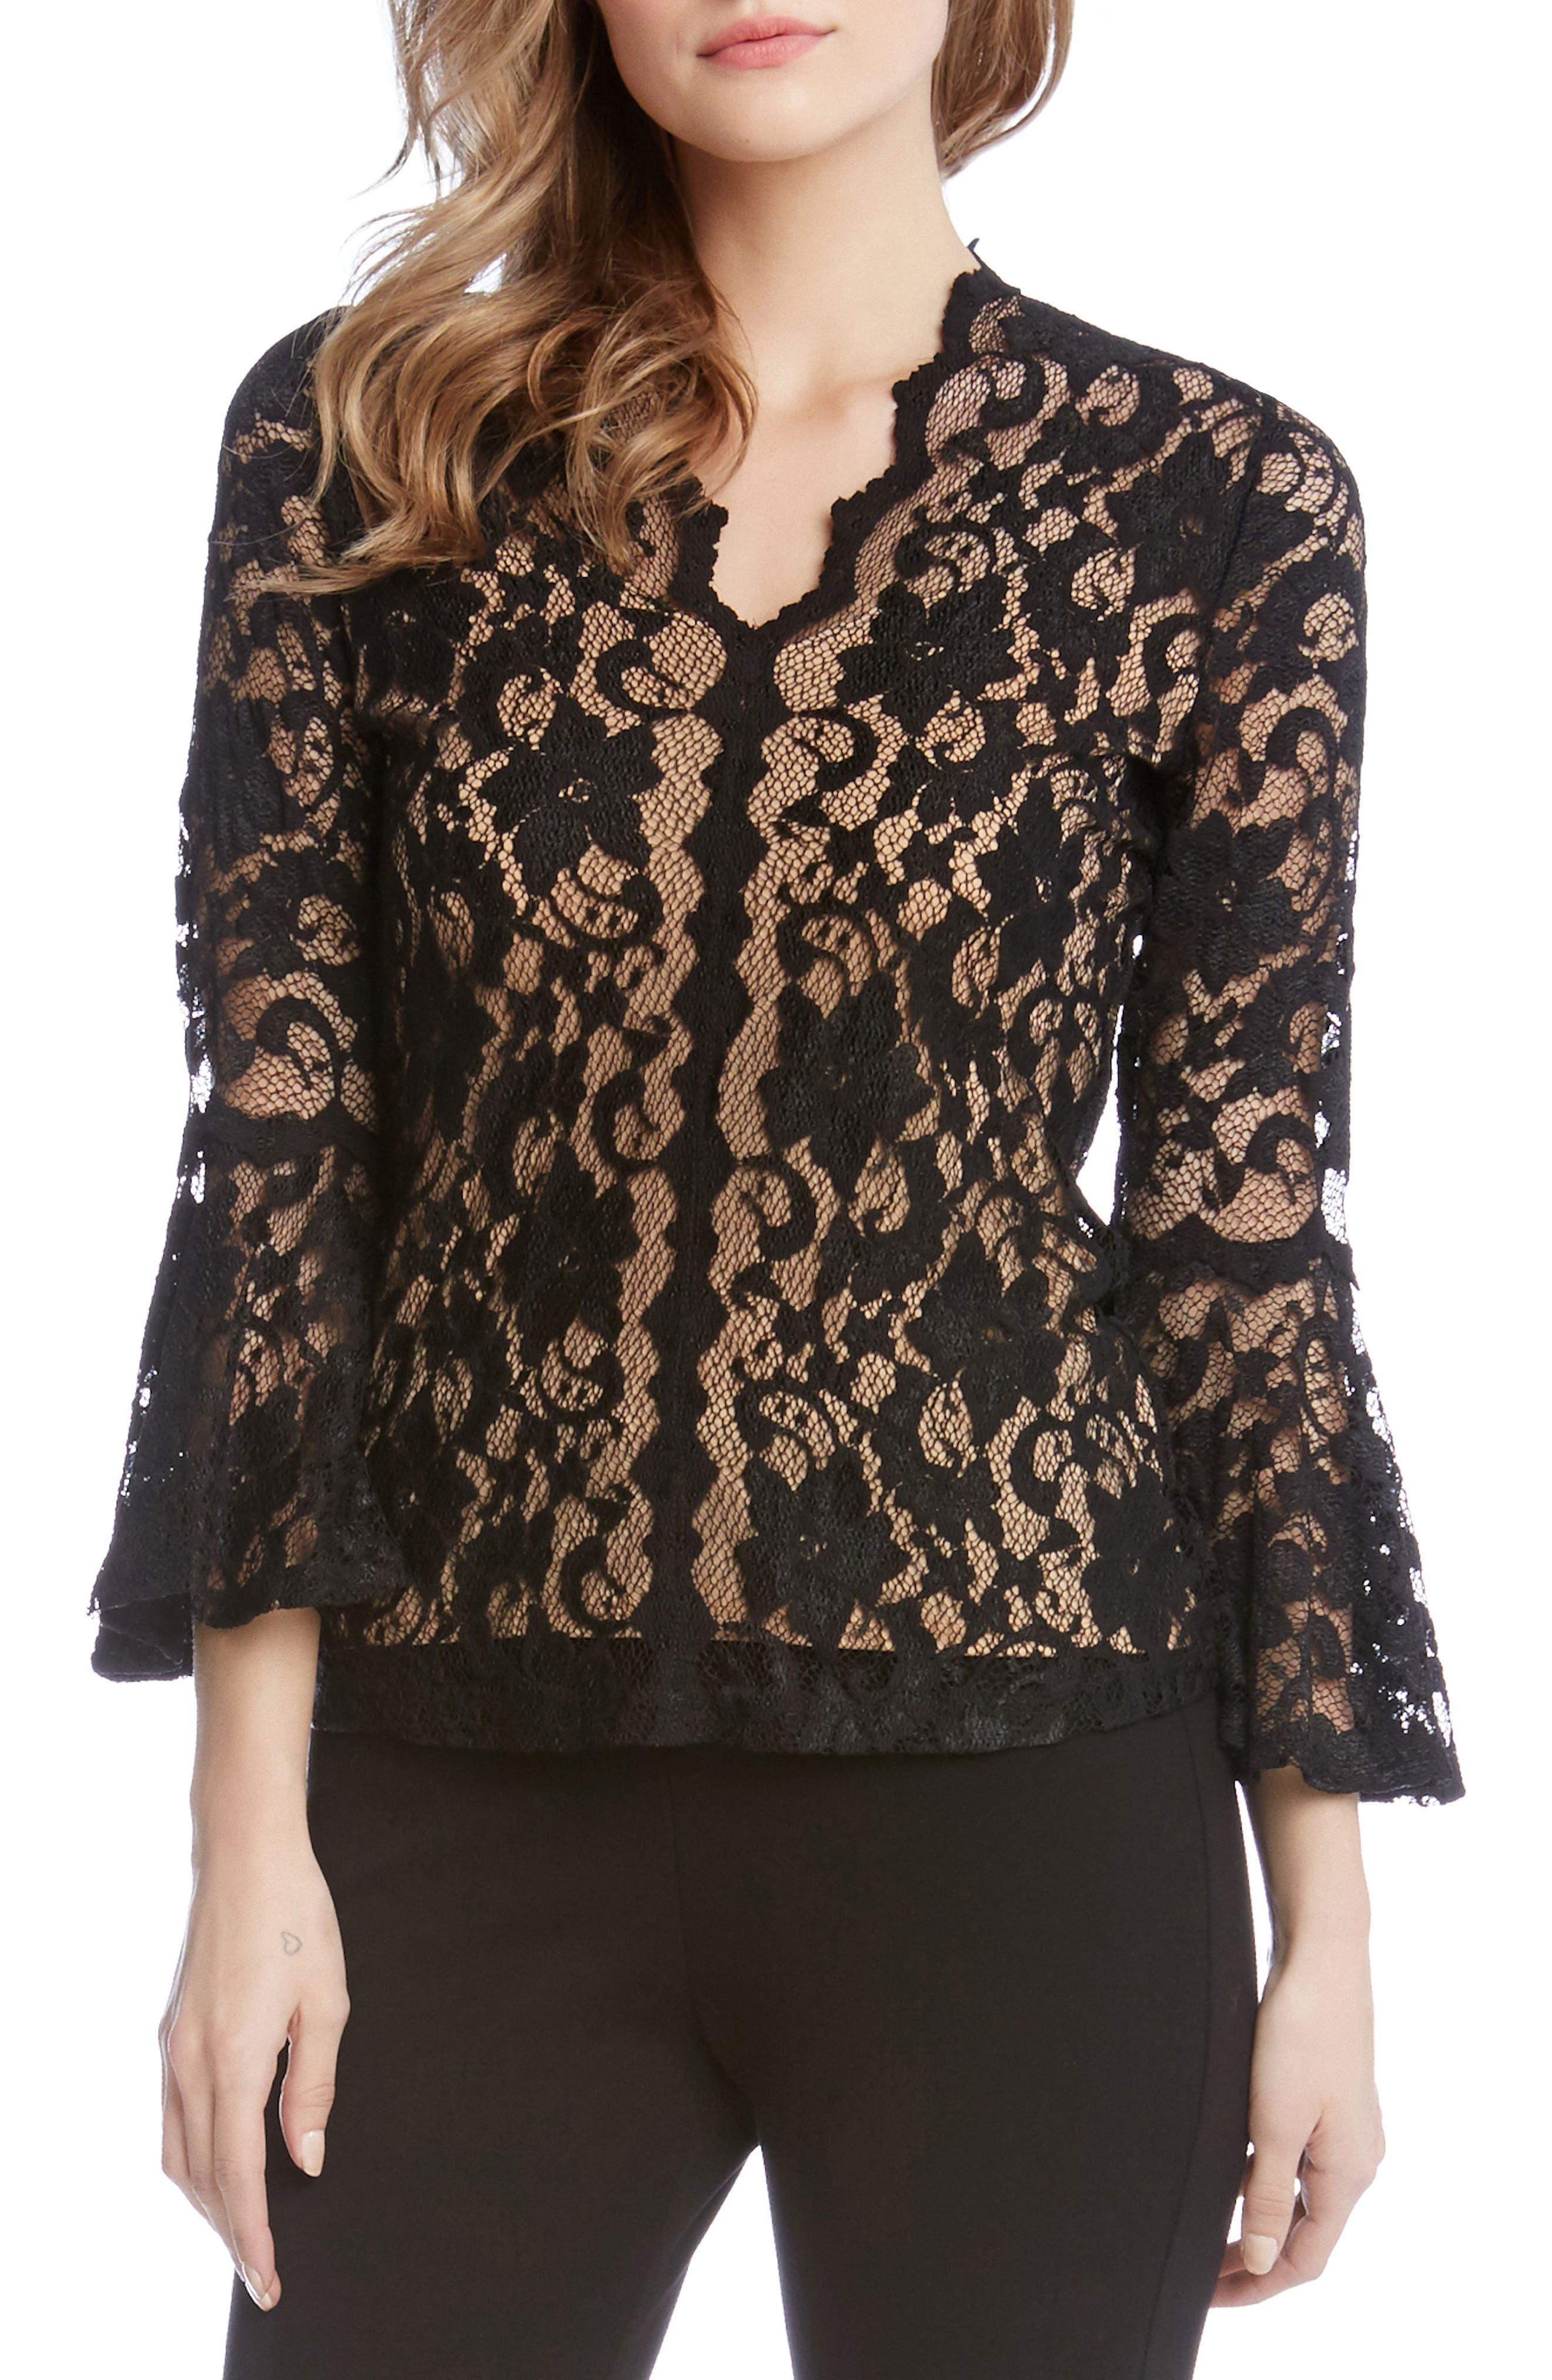 Alternate Image 1 Selected - Karen Kane Bell Sleeve Scalloped Lace Top